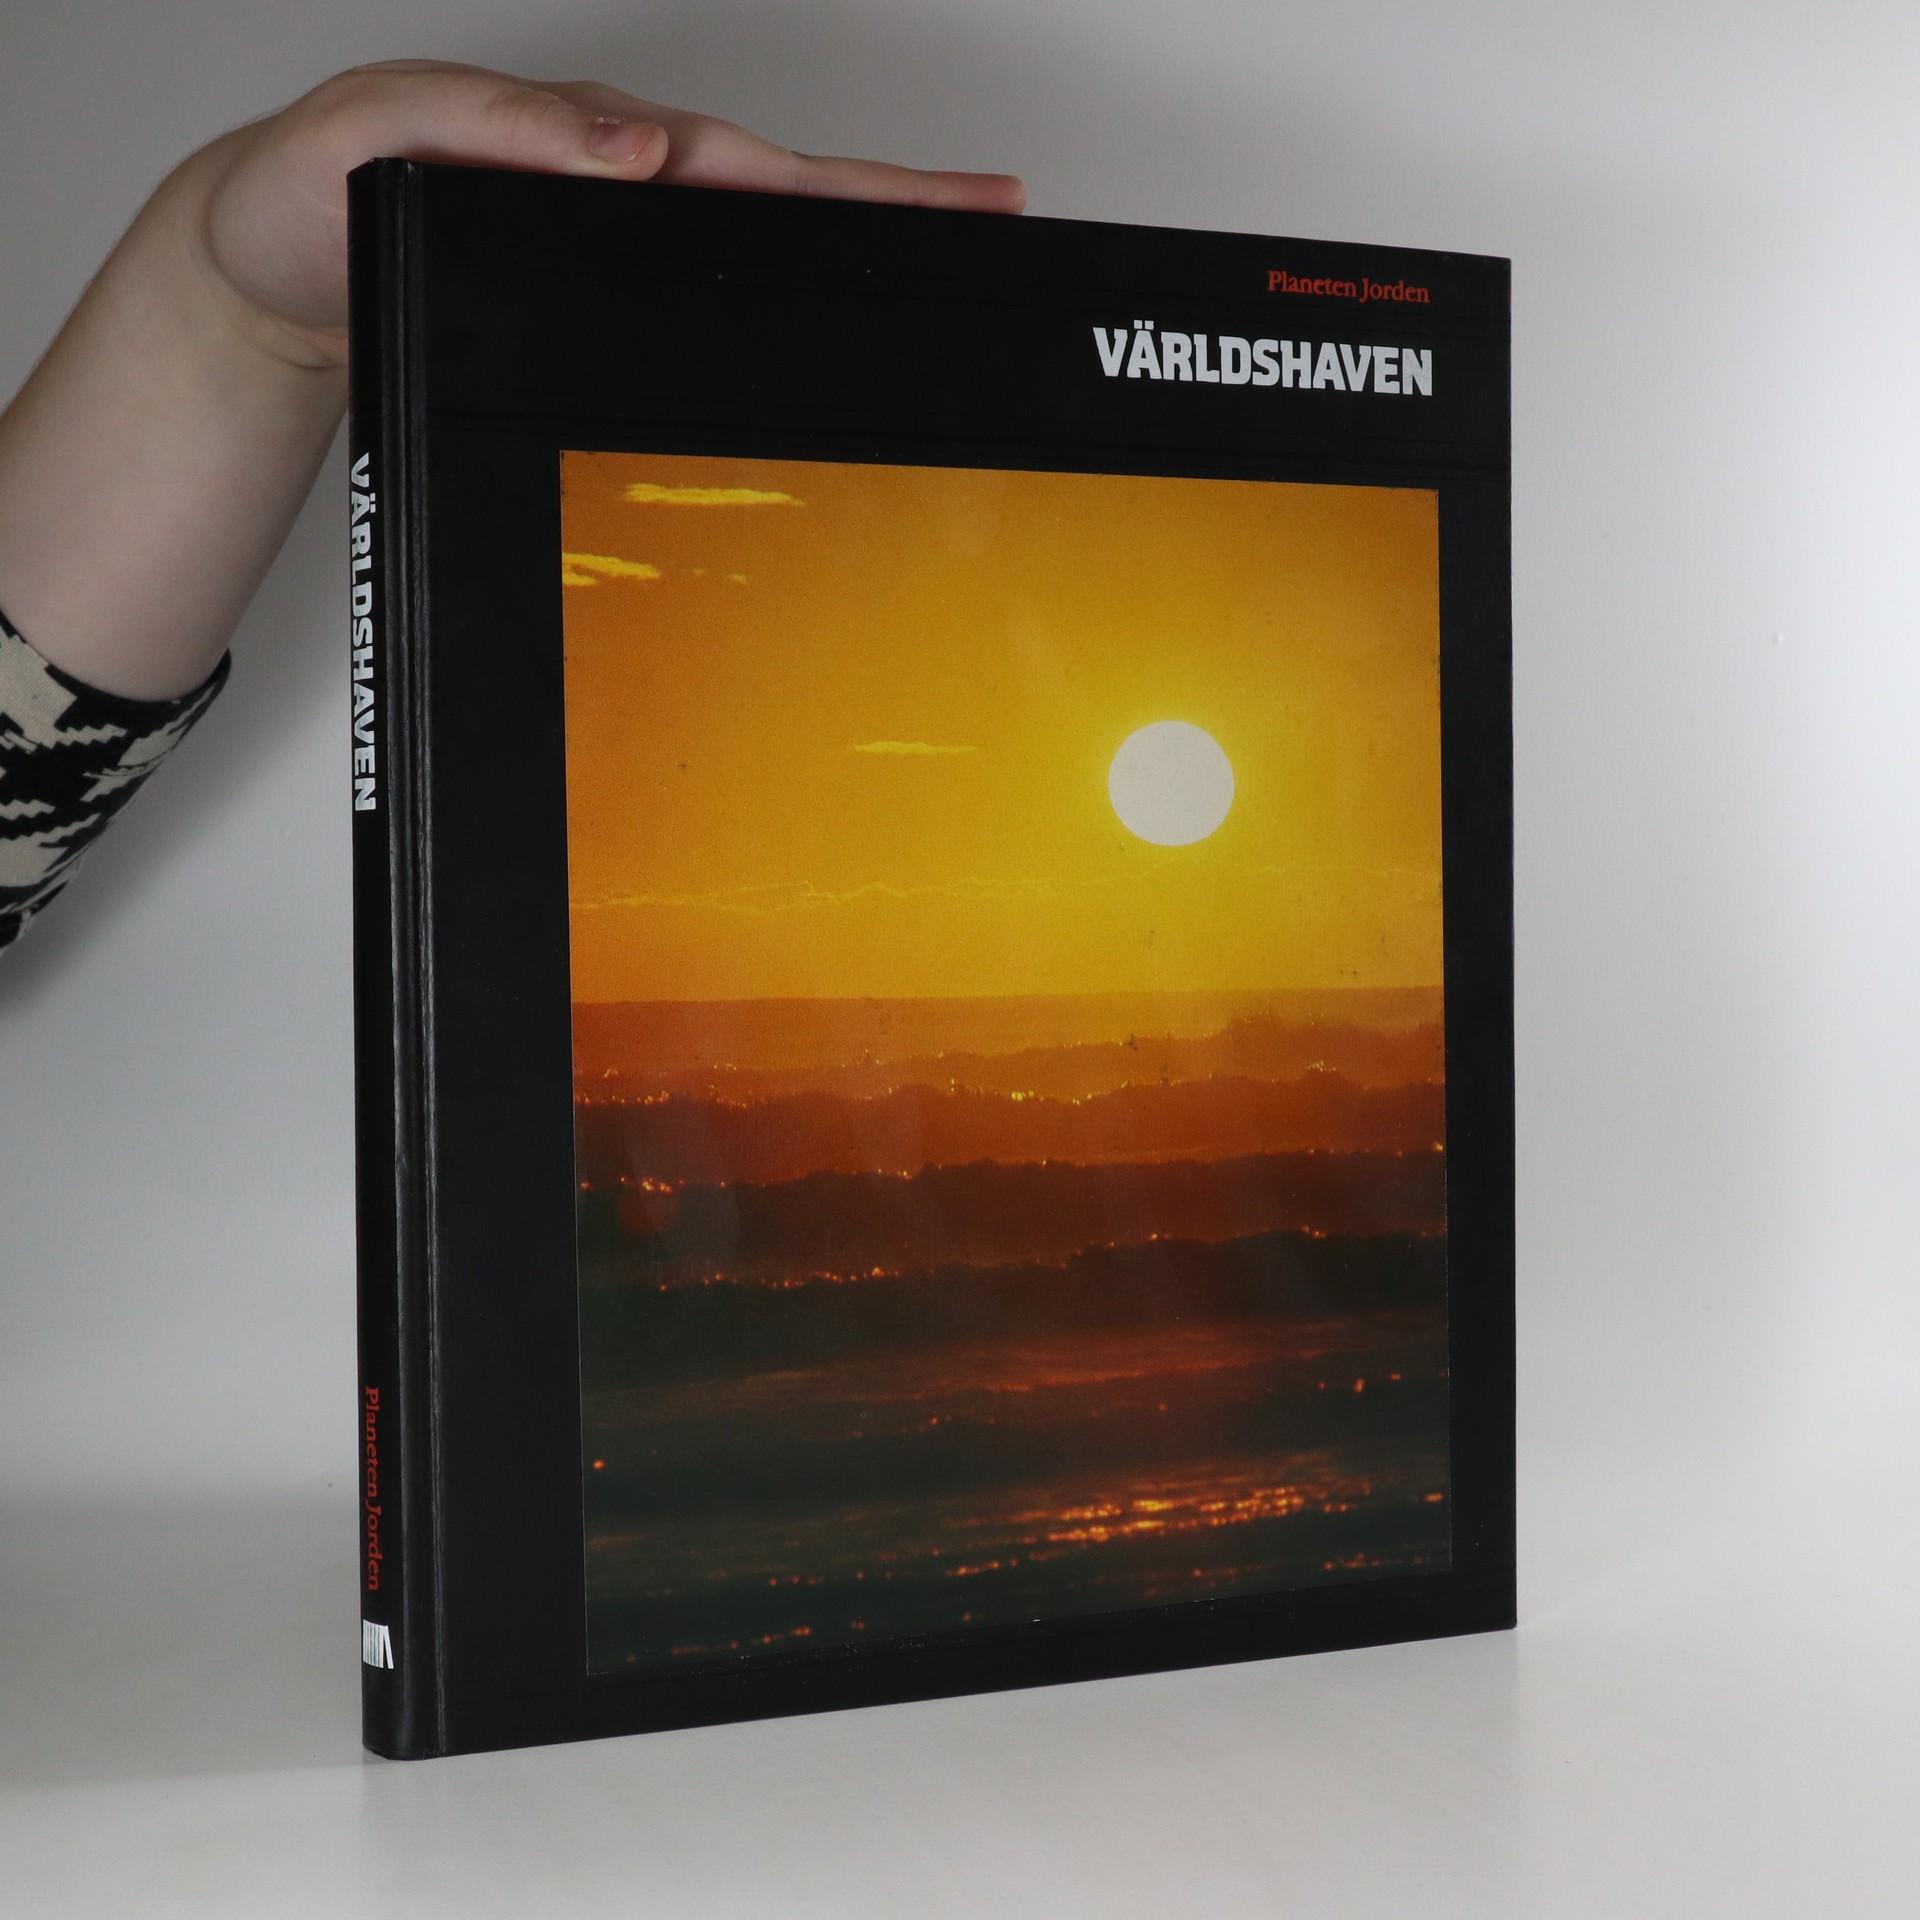 antikvární kniha Världshaven, 1985